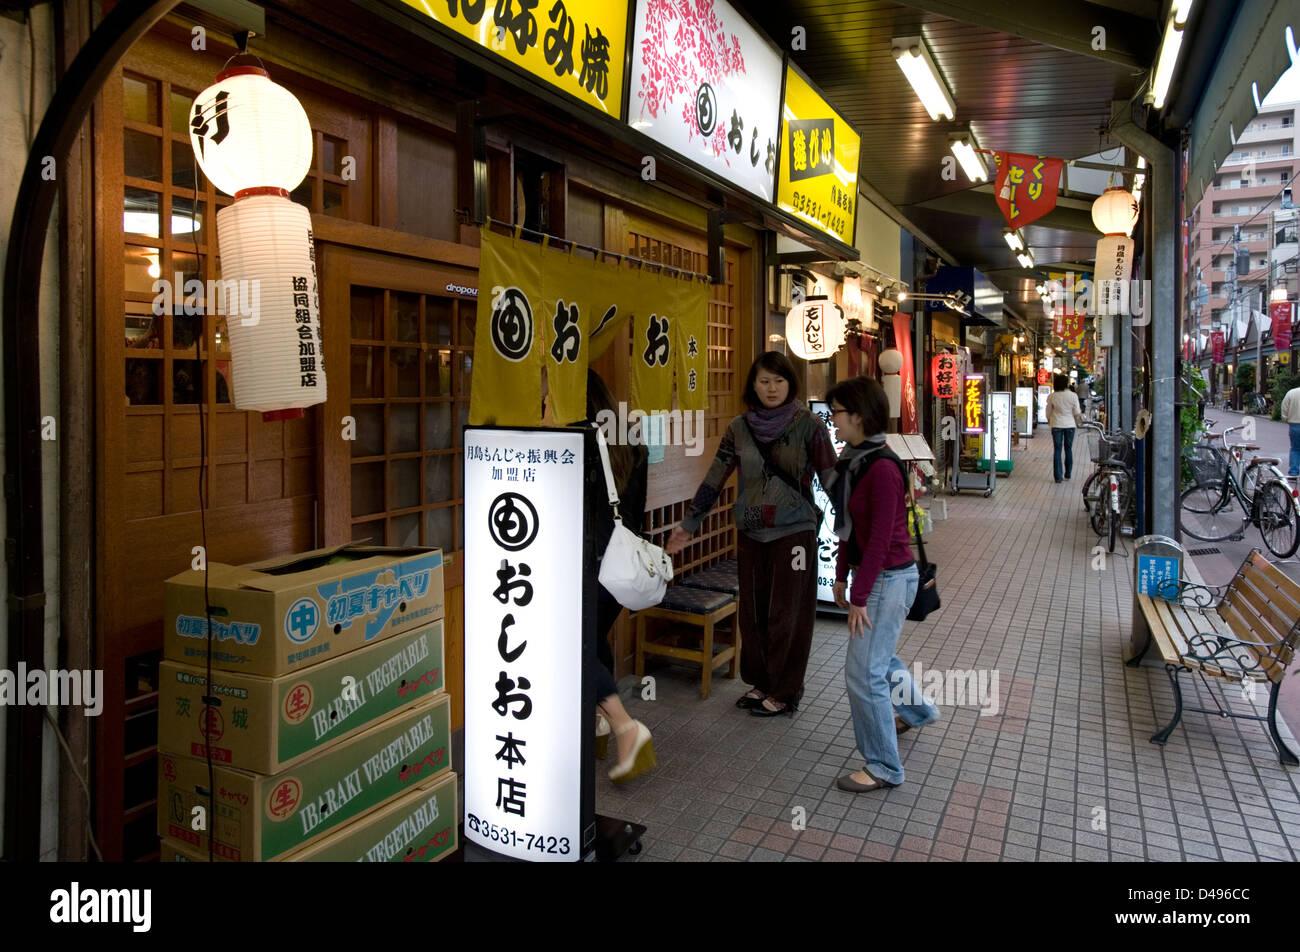 Patrons entering a manjayaki restaurant, where one can enjoy Japanese okonomiyaki style pizza in the Tsukishima, - Stock Image